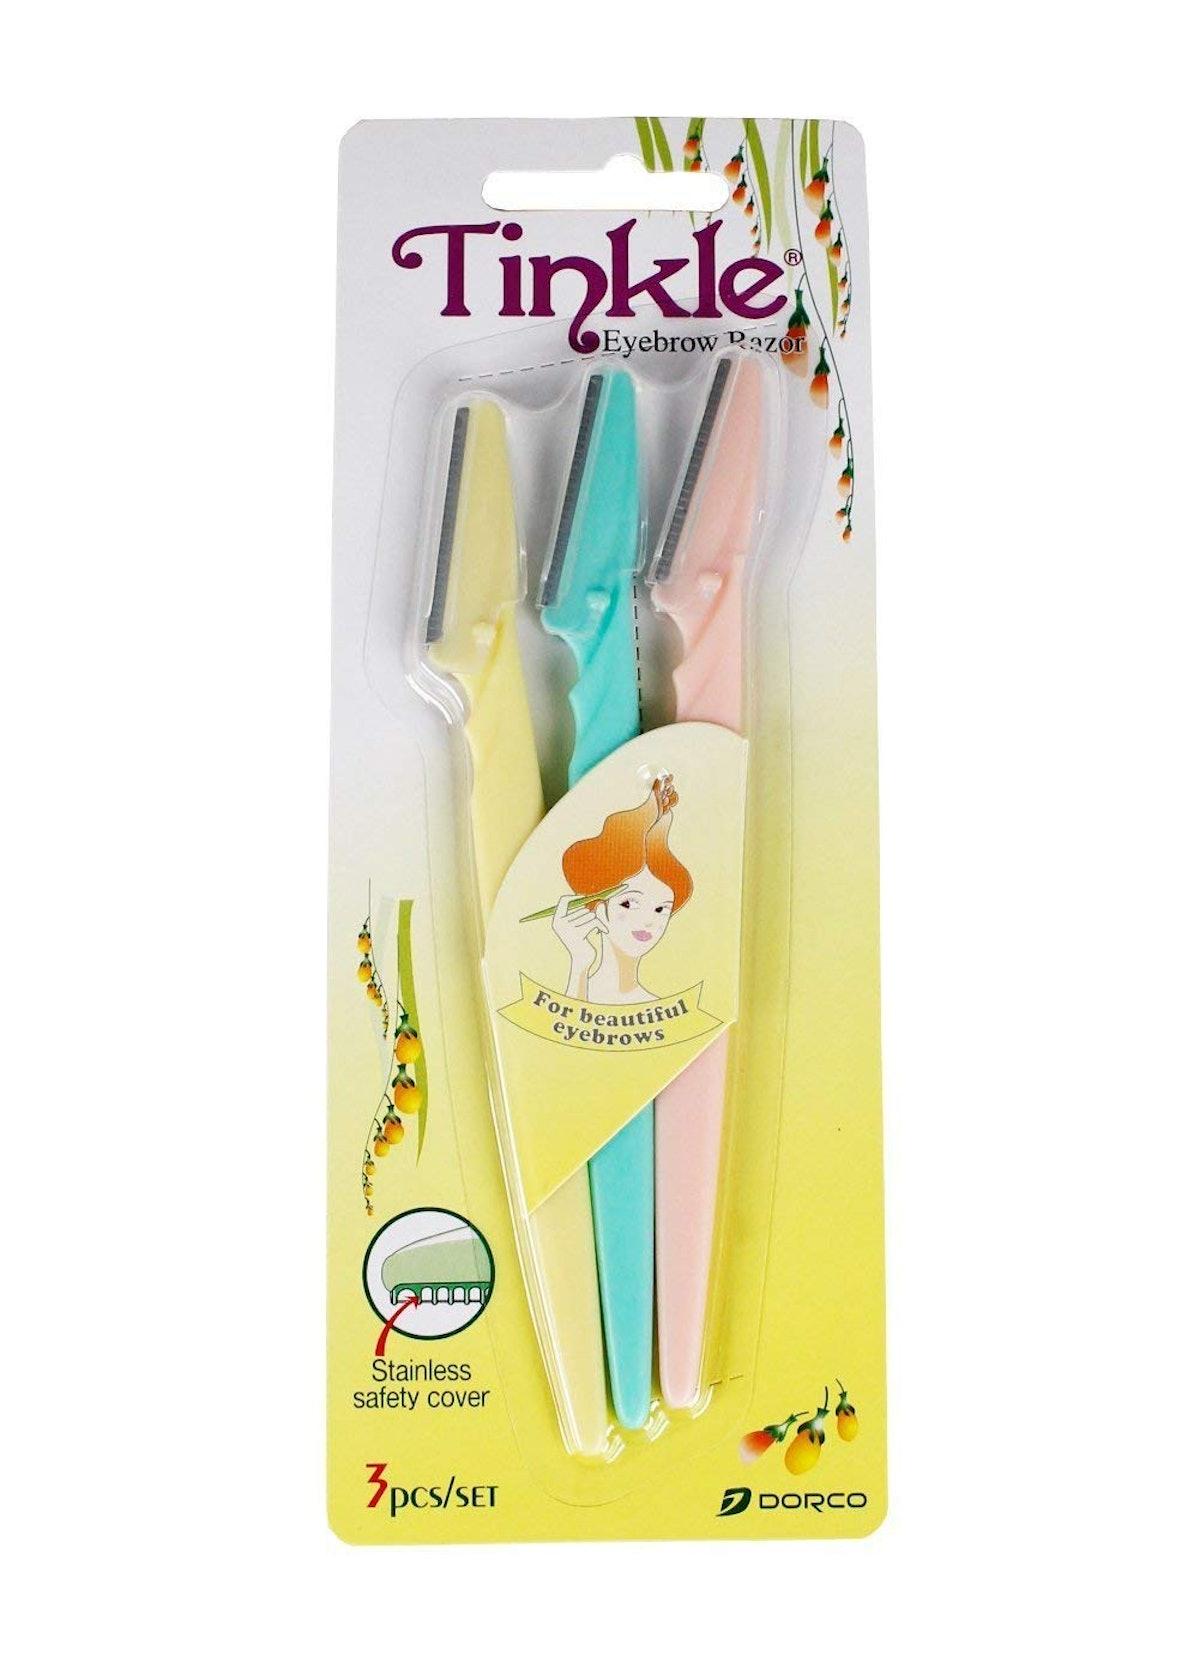 Tinkle Eyebrow Razors (3 Pack)